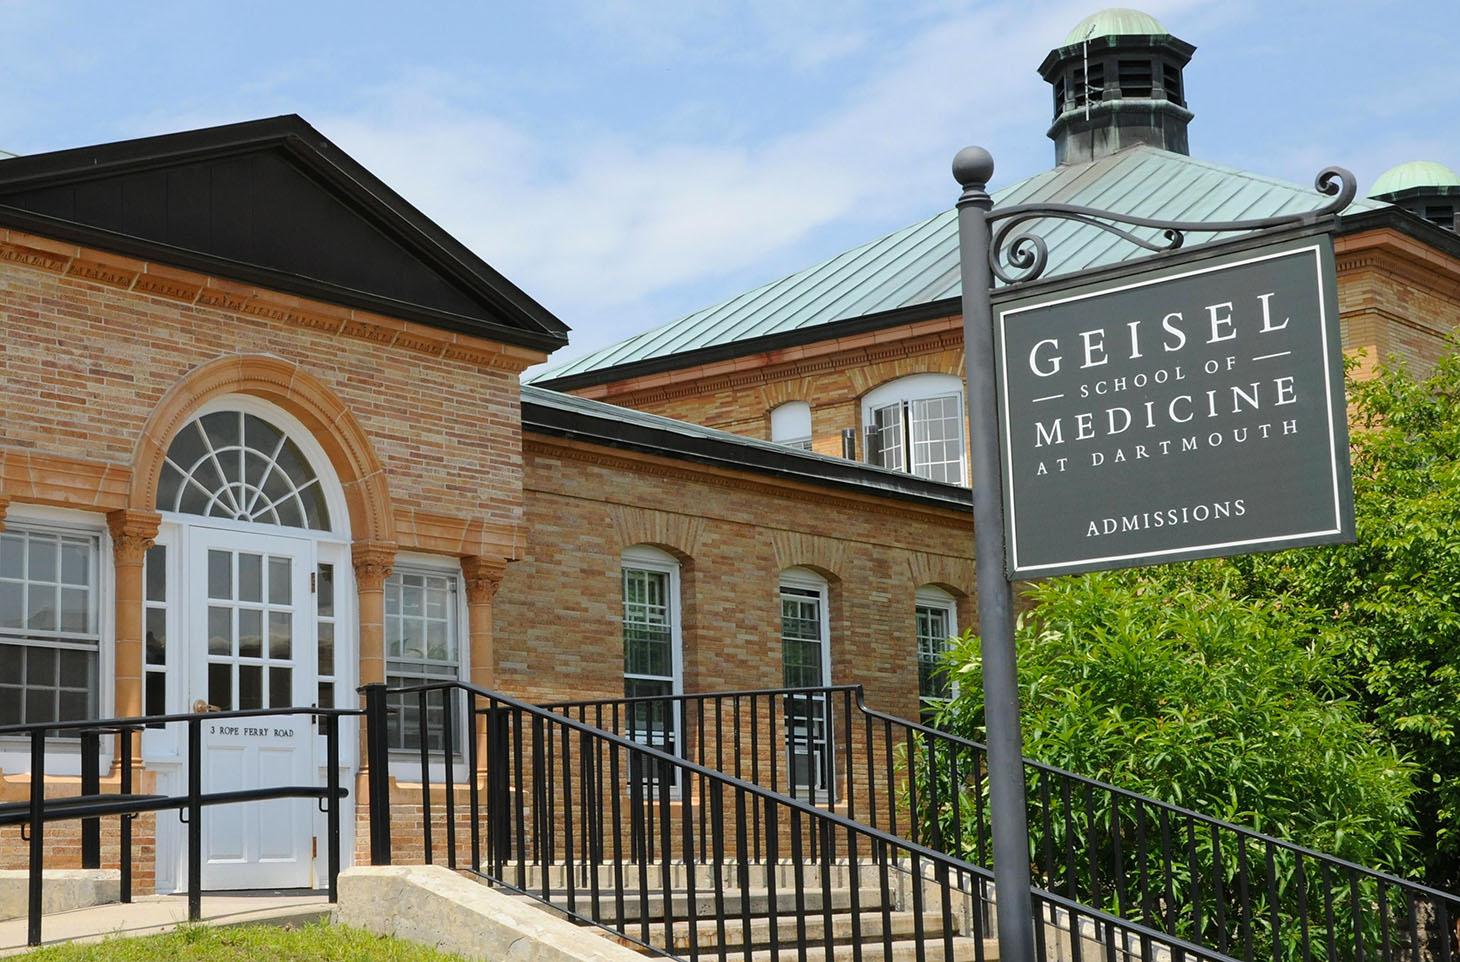 Geisel School of Medicine Admissions